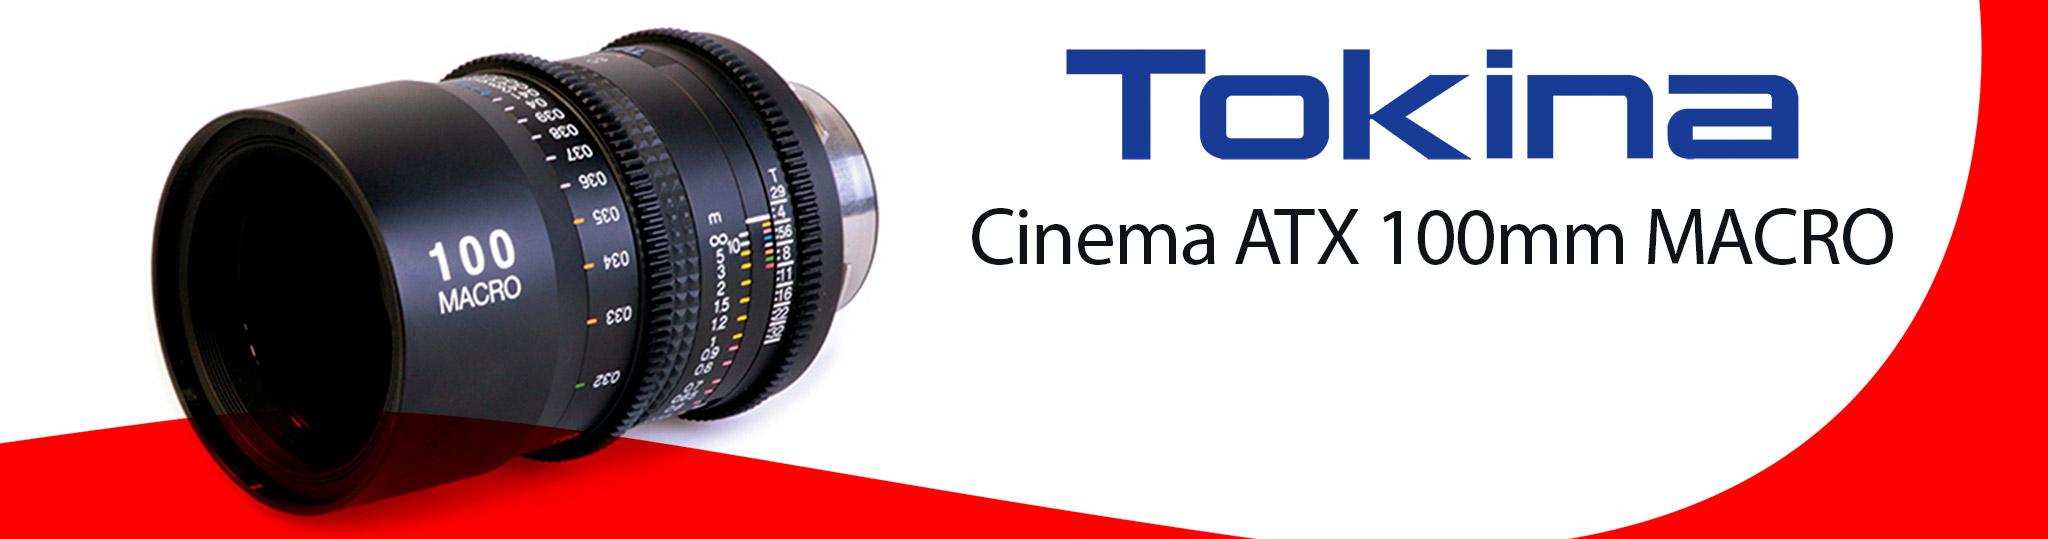 Óptica de cine Tokina Cinema ATX 100 Macro